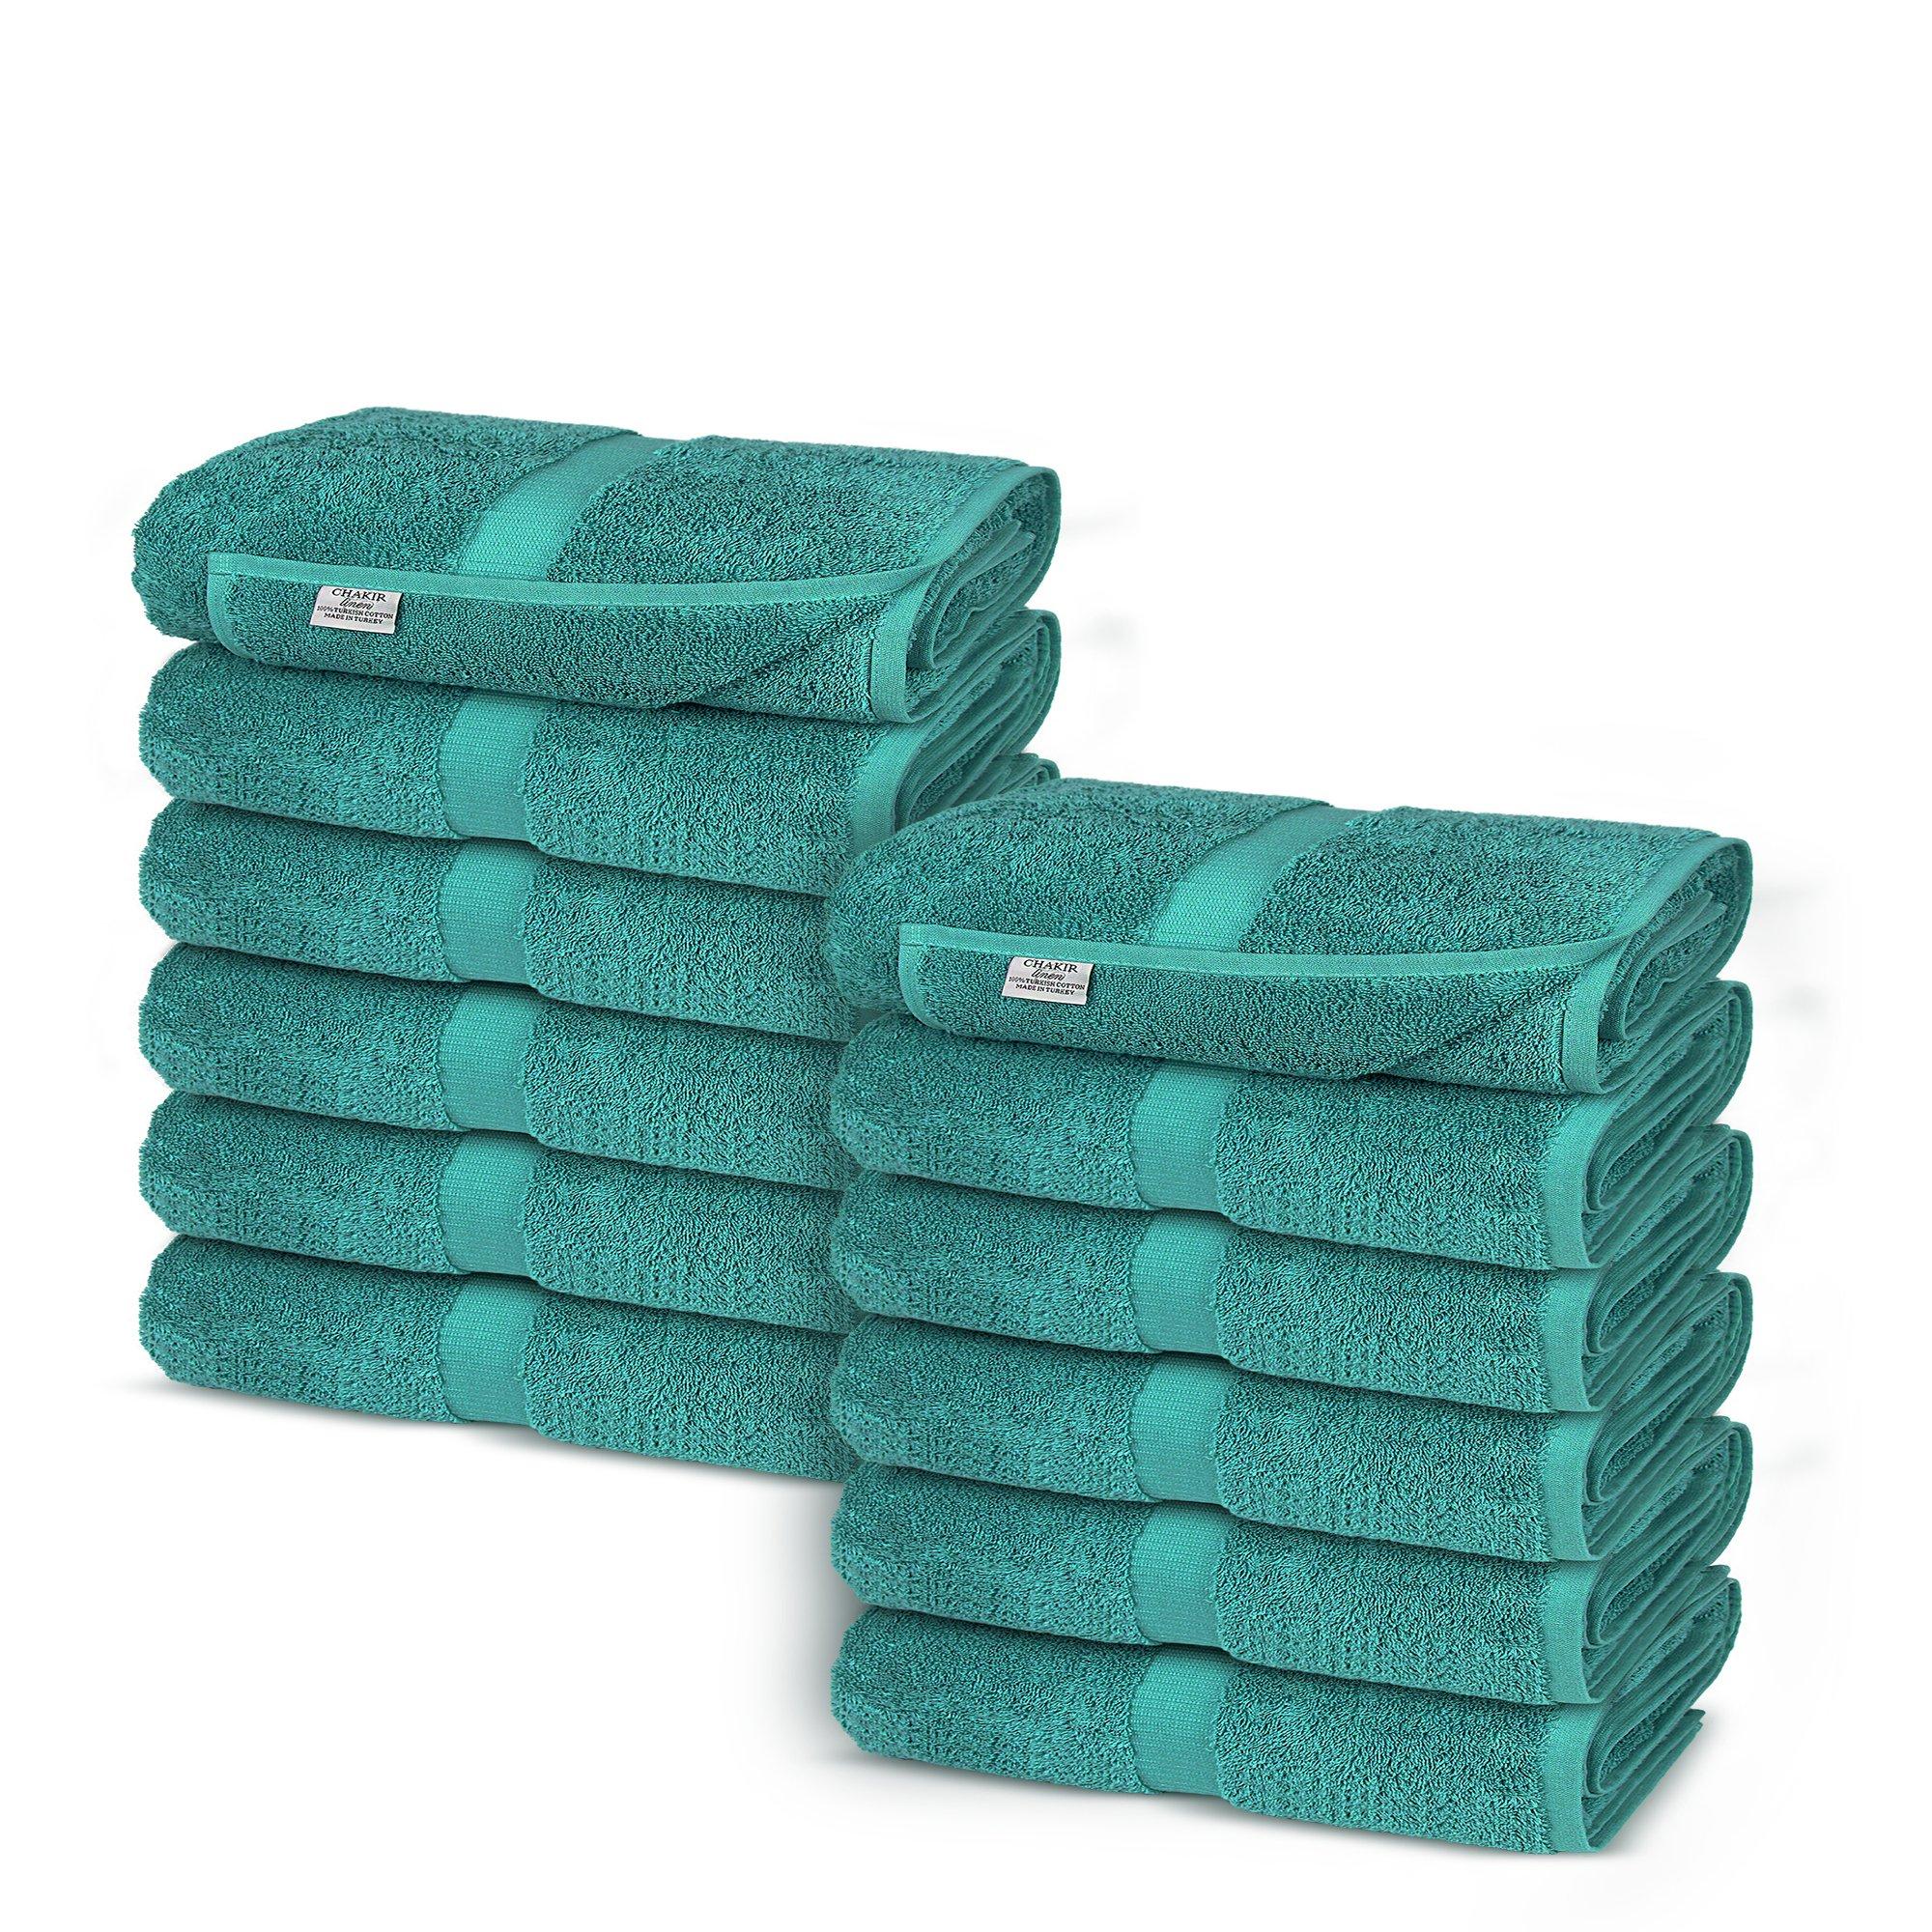 Chakir Turkish Linens Turkish Cotton Luxury Hotel & Spa Bath Towel, Wash Cloth - Set of 12, Aqua